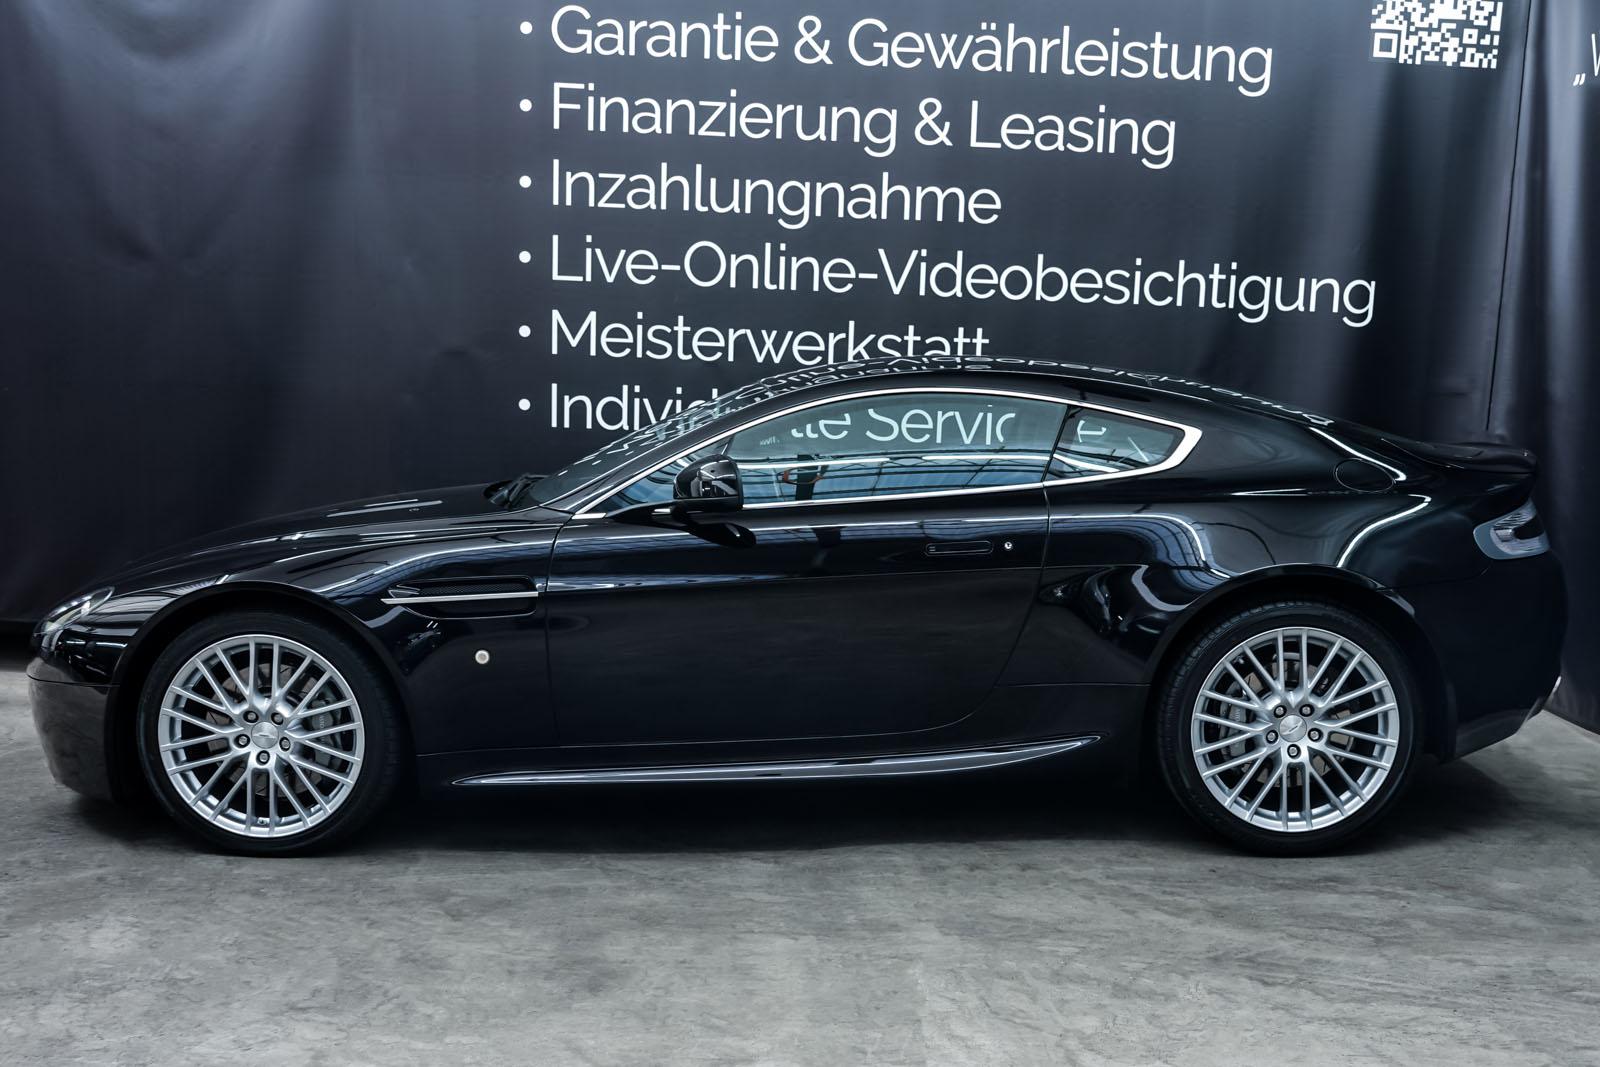 AstonMartin_V8_Vantage_Schwarz_Schwarz_AM-5679_5_w